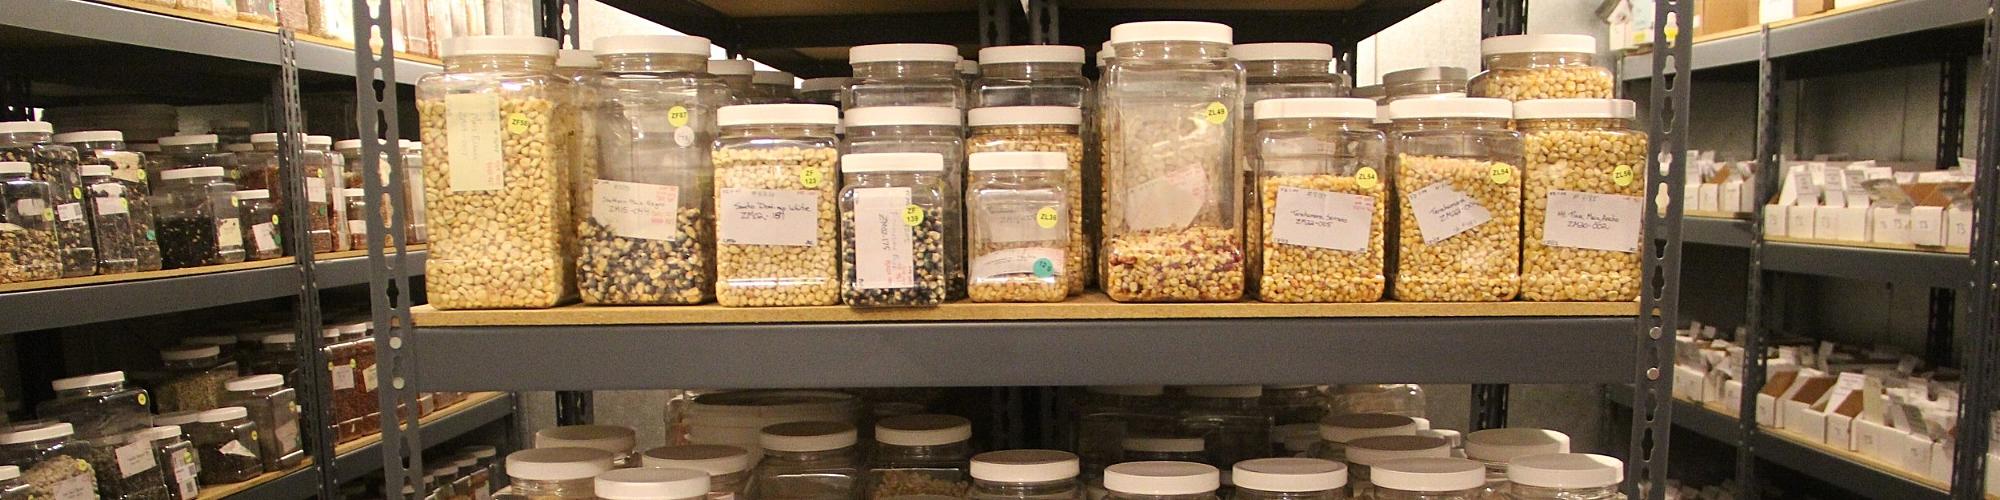 Seed Bank.jpg